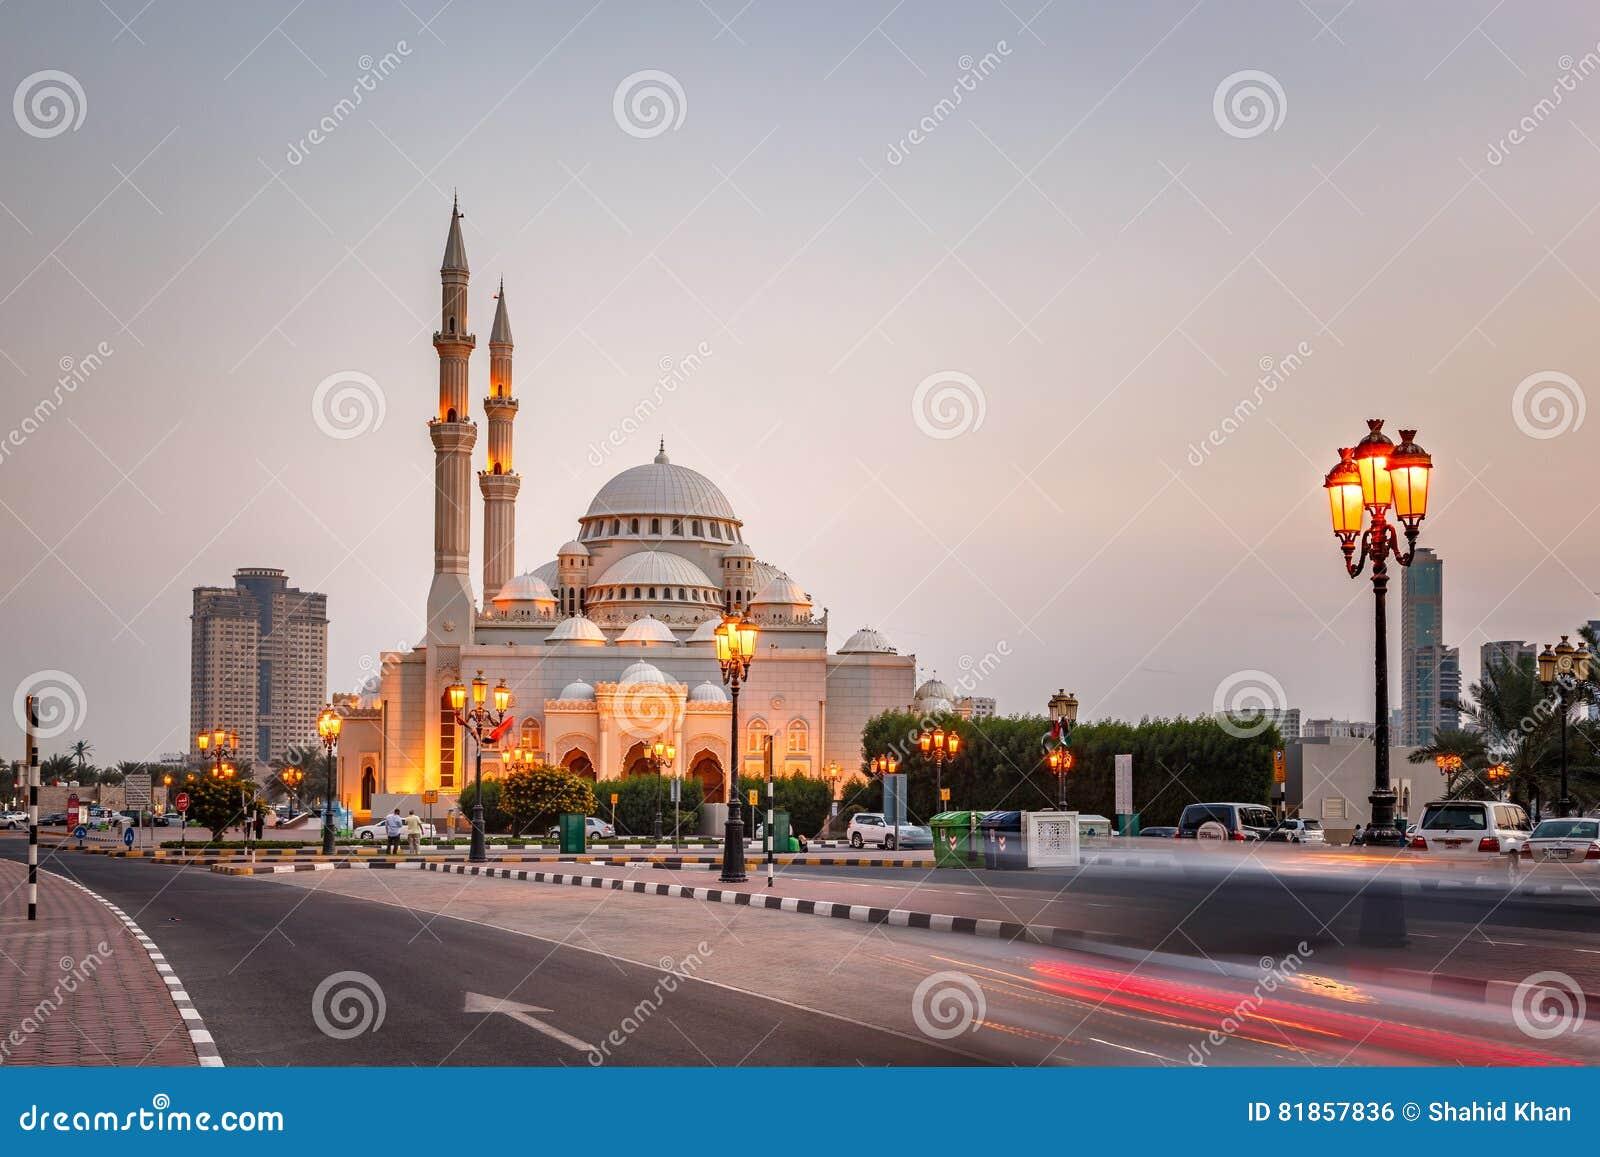 Al-Noor Mosque Sharjah UAE